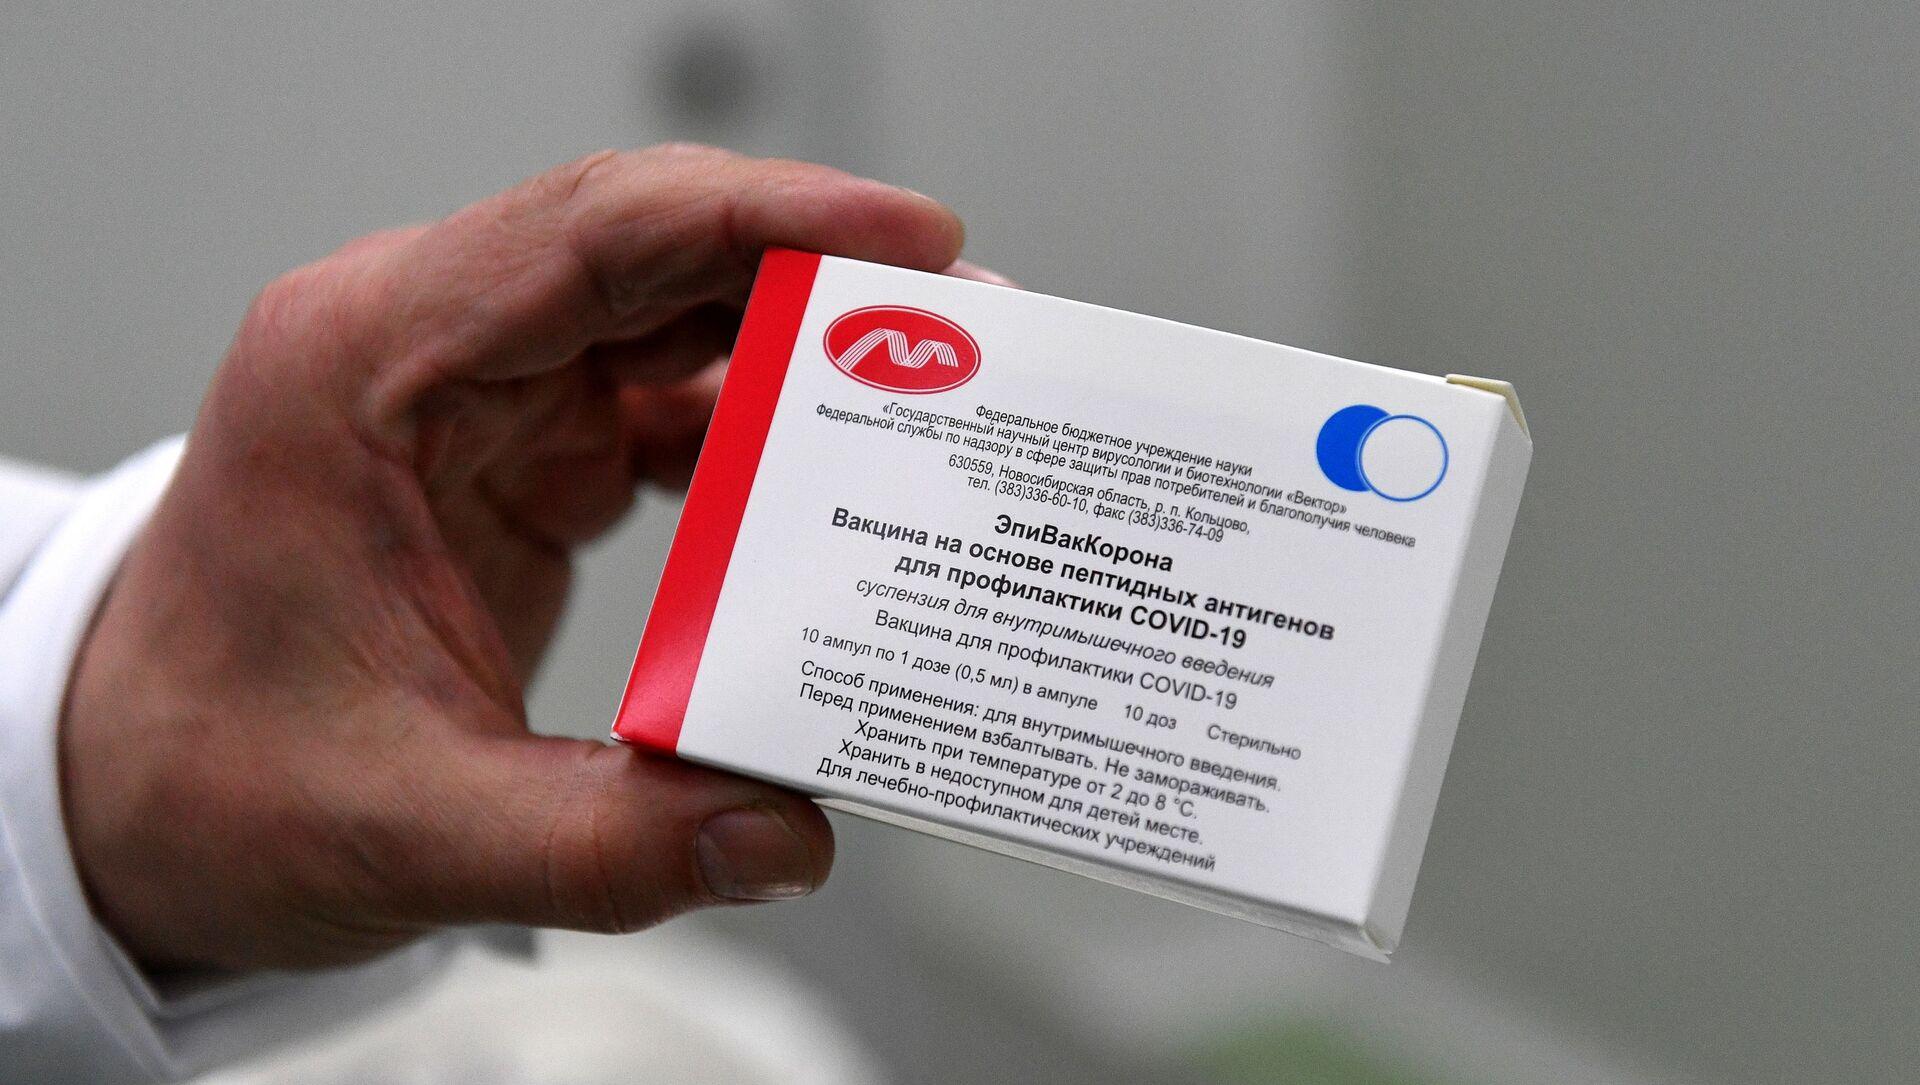 Руска вакцина против вируса корона ЕпиВакКорона центра Вектор - Sputnik Србија, 1920, 27.03.2021